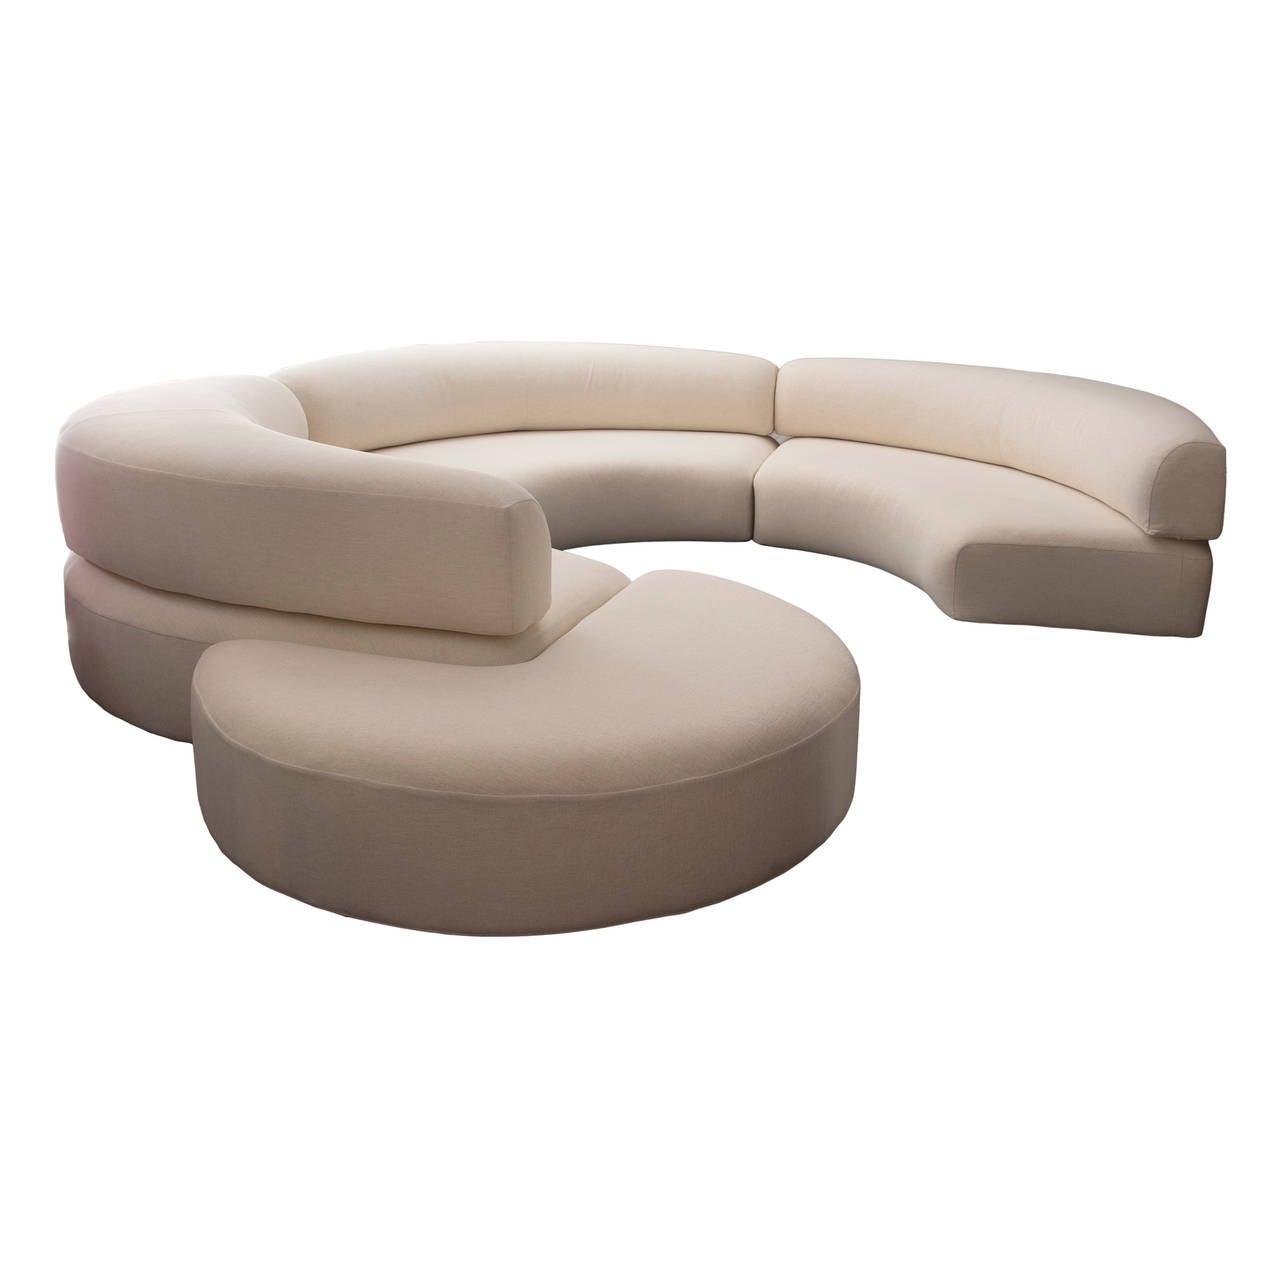 Ennio chiggio sofa model quotenviron zeroquot circa 1960 italy for Round sectional sofa set manufacturers